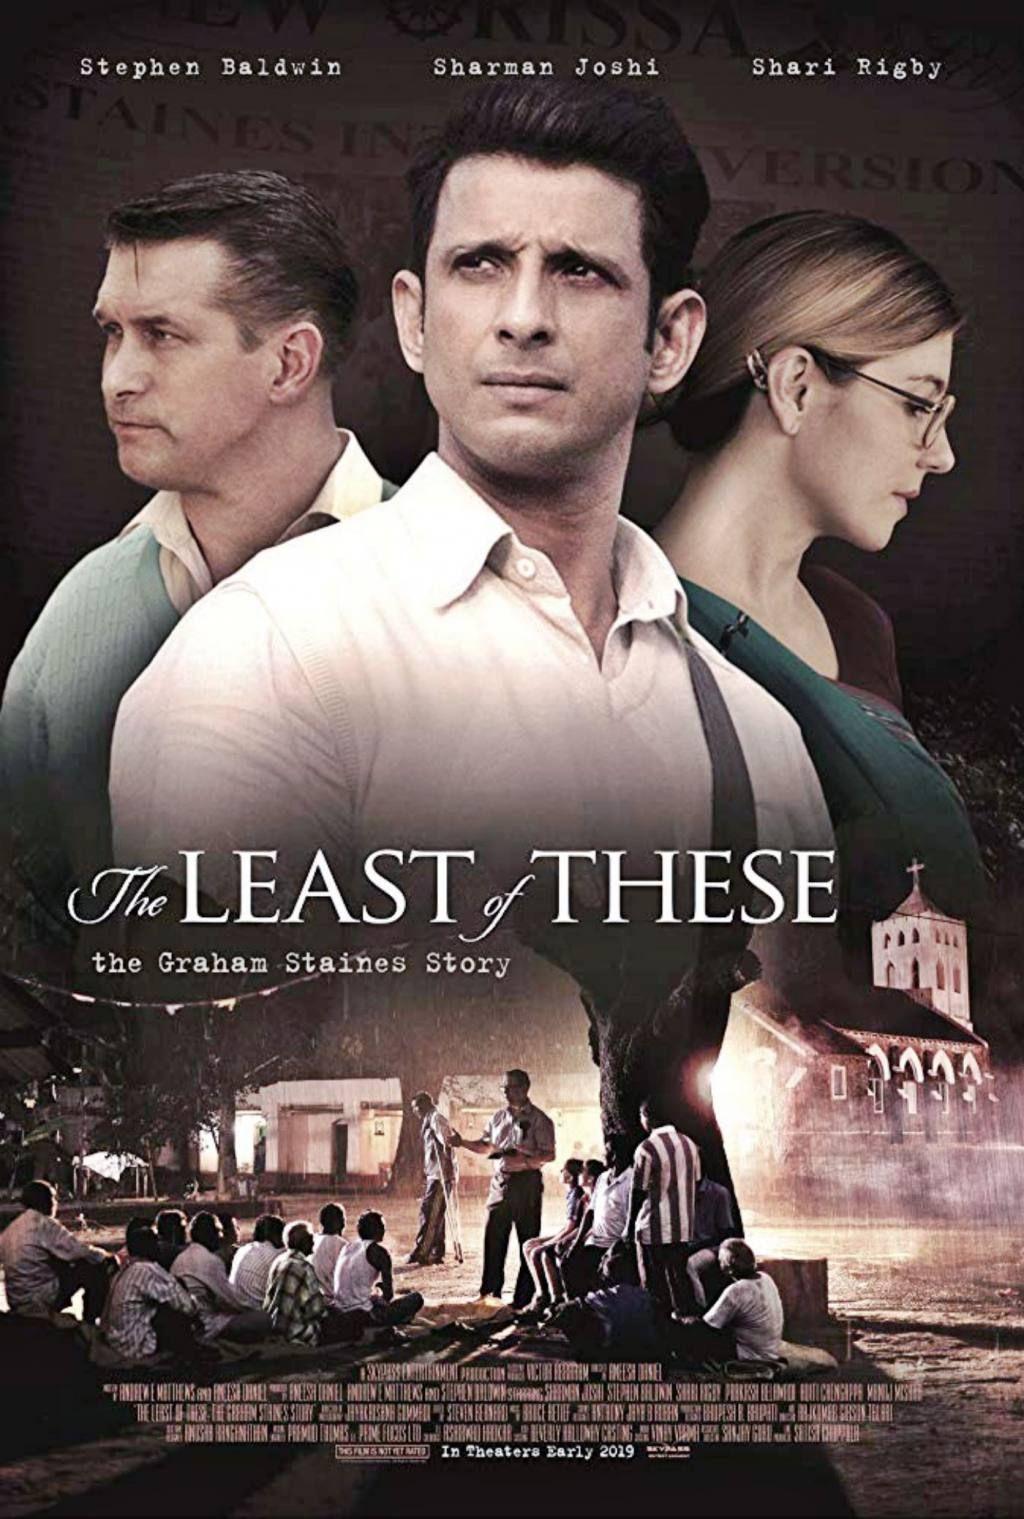 Pelculas Cristianas Hindi Movies Great Expectations Movie Movie Plot